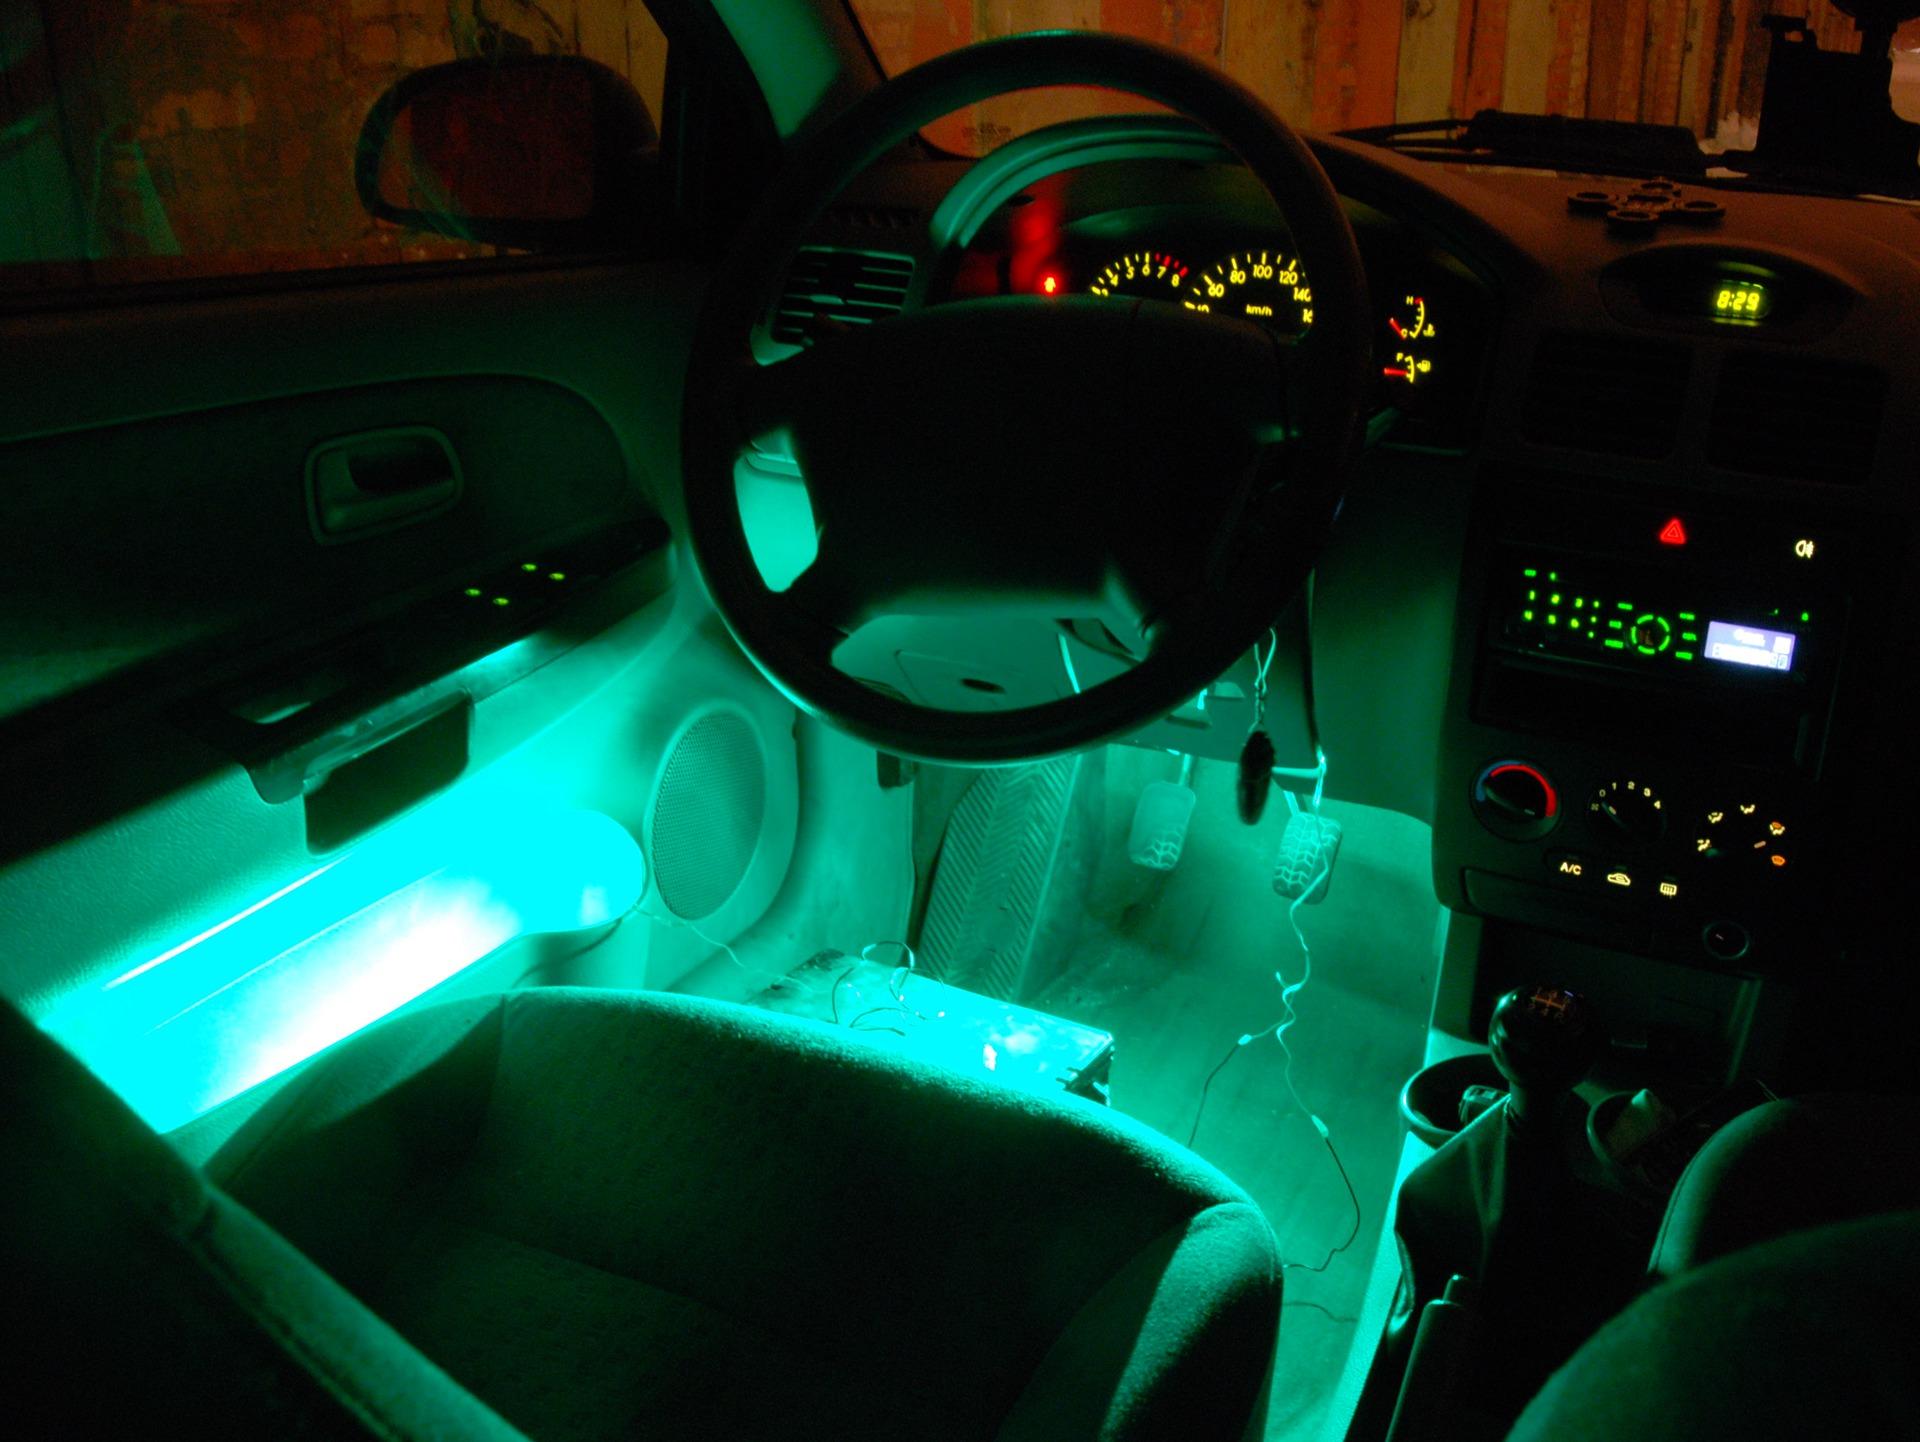 Тюнинг подсветки салона авто своими руками